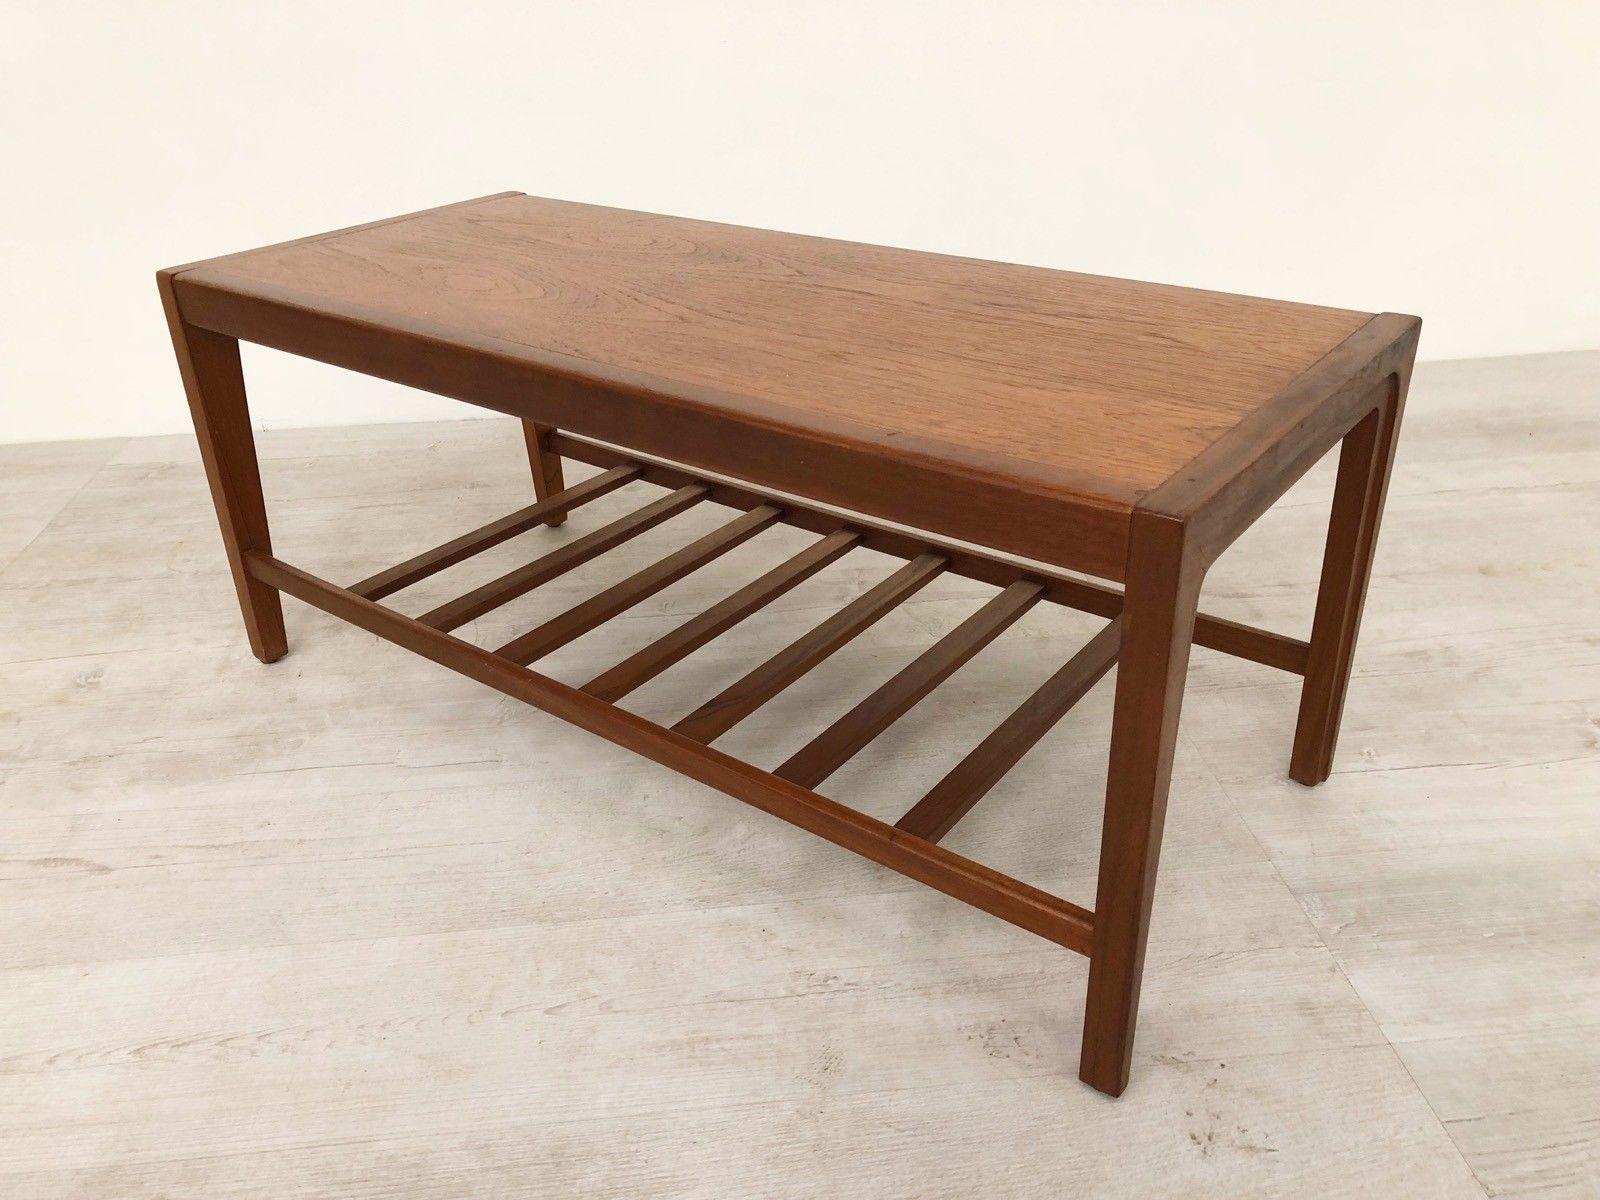 Vintage Mid Century 70s Teak Coffee Table With Magazine Storage